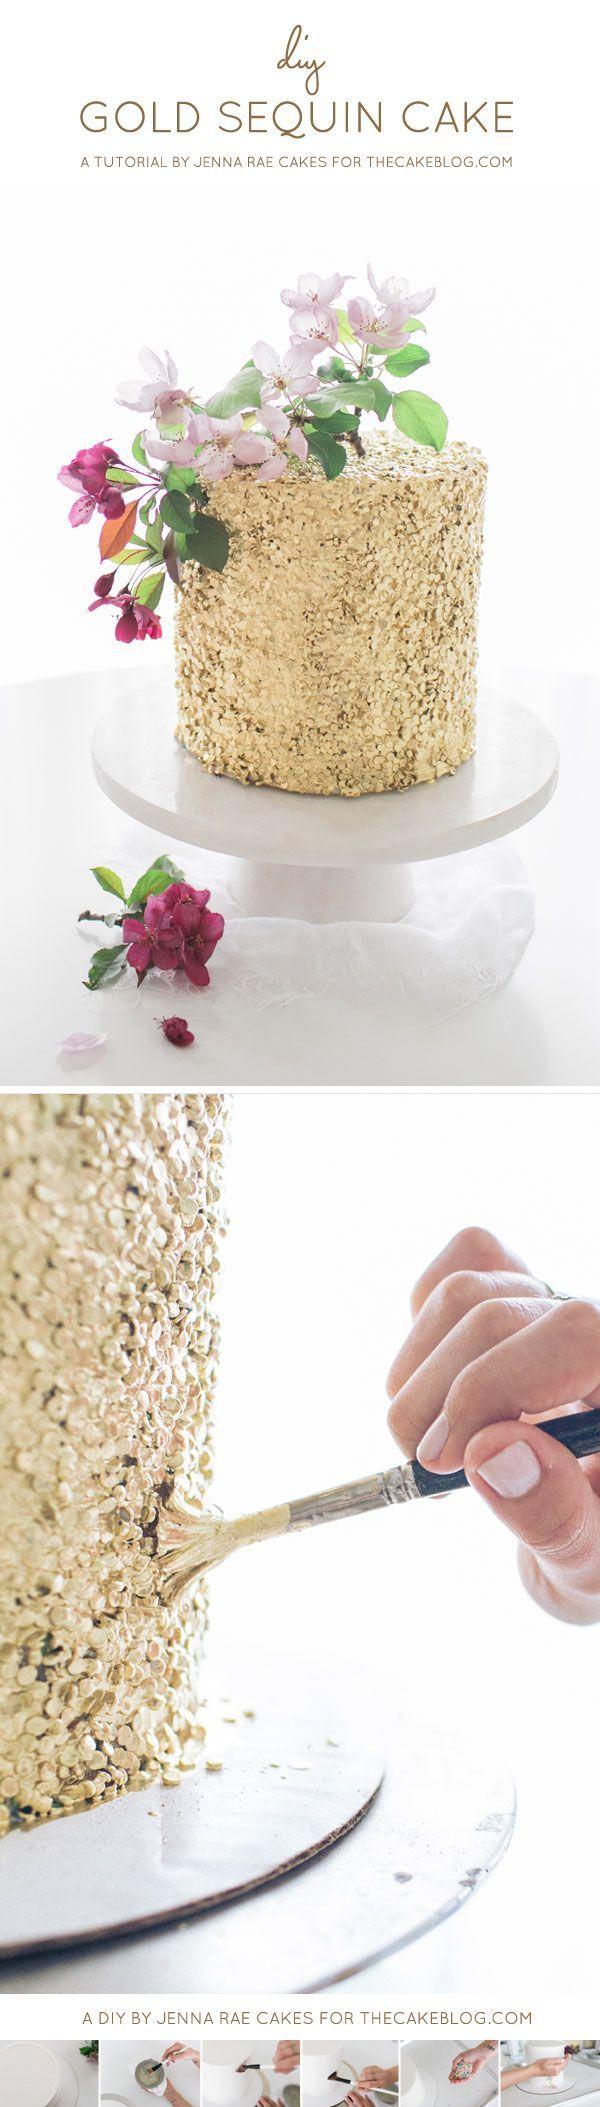 More simple wedding cake: http://tips-wedding.com/wedding-cake-ideas How to make a Gold Sequin Cake | Metallic Sequin Cake Tutorial | by Jenna Rae Cakes for http://TheCakeBlog.com